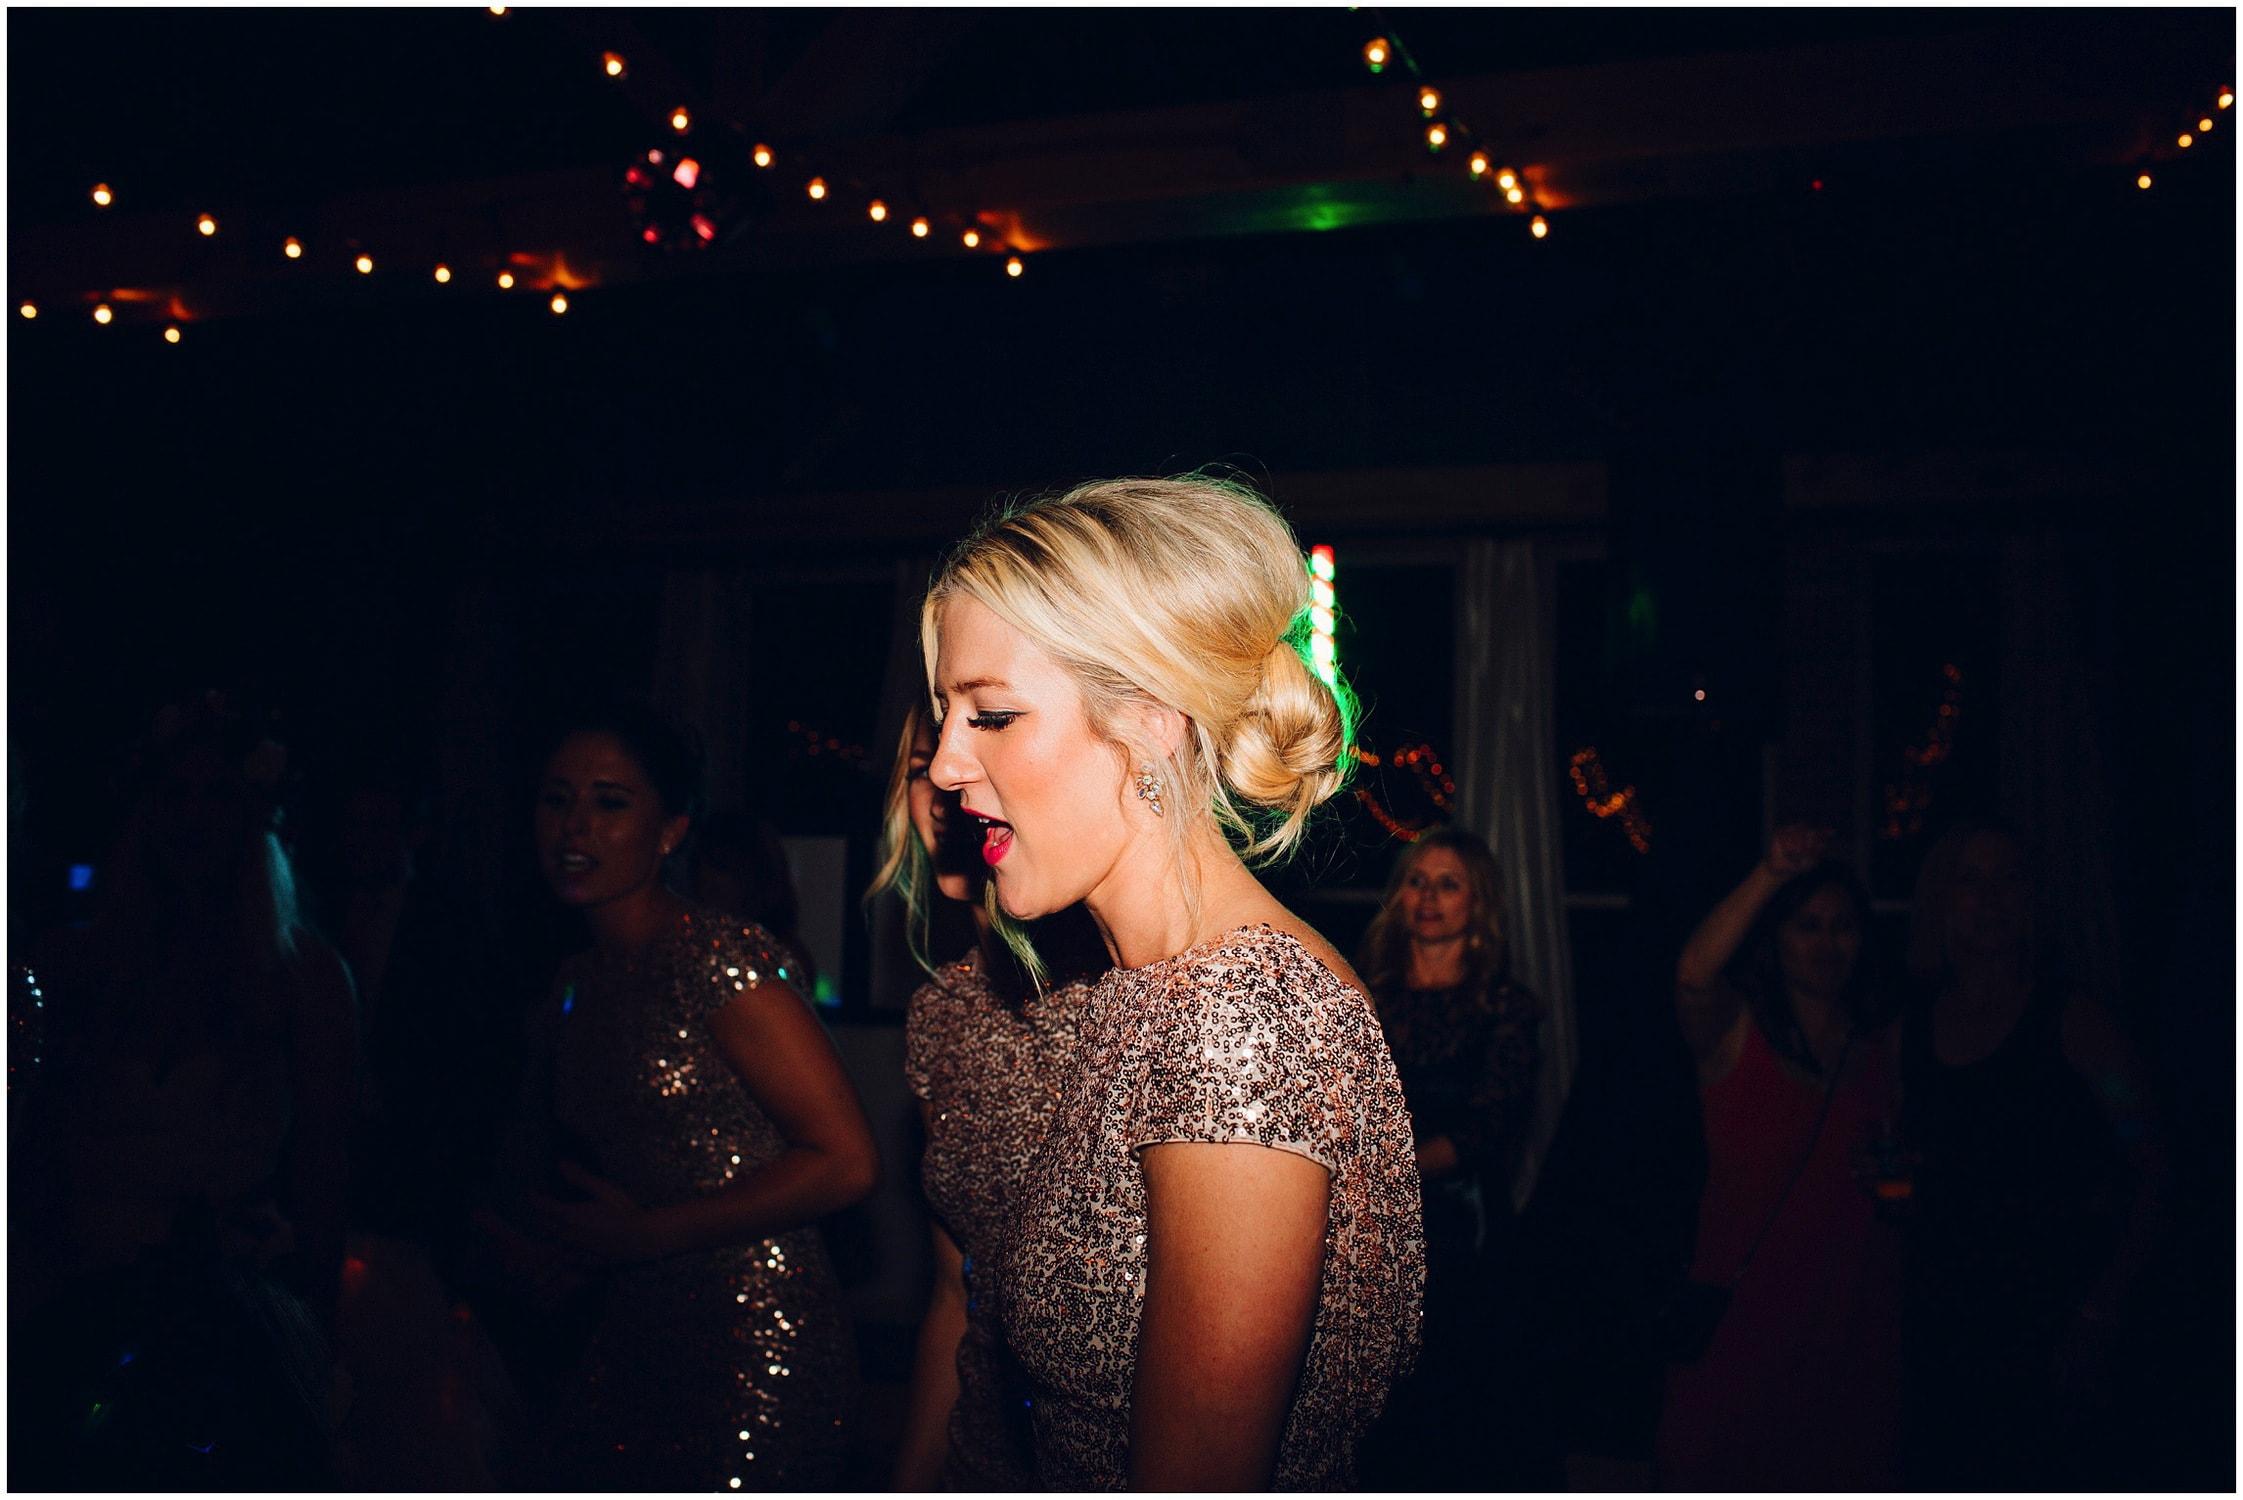 southwindhills_oklahoma_wedding1021_blogstomped